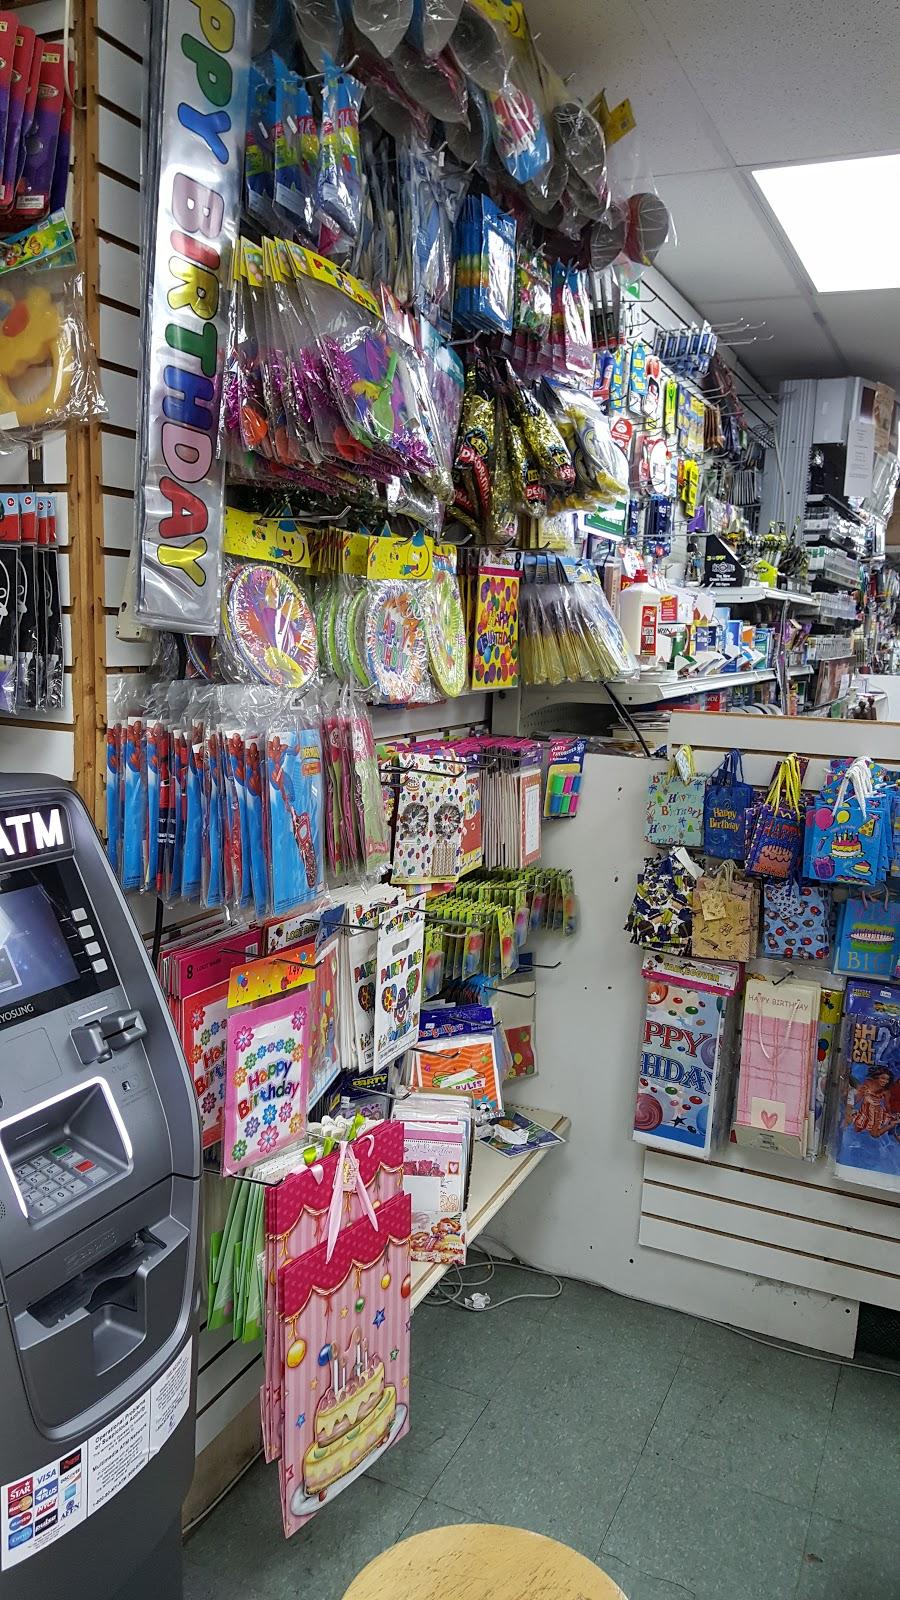 Sunrise Convenience Store - convenience store    Photo 8 of 10   Address: 6905 Bergenline Ave, Guttenberg, NJ 07093, USA   Phone: (201) 854-4324